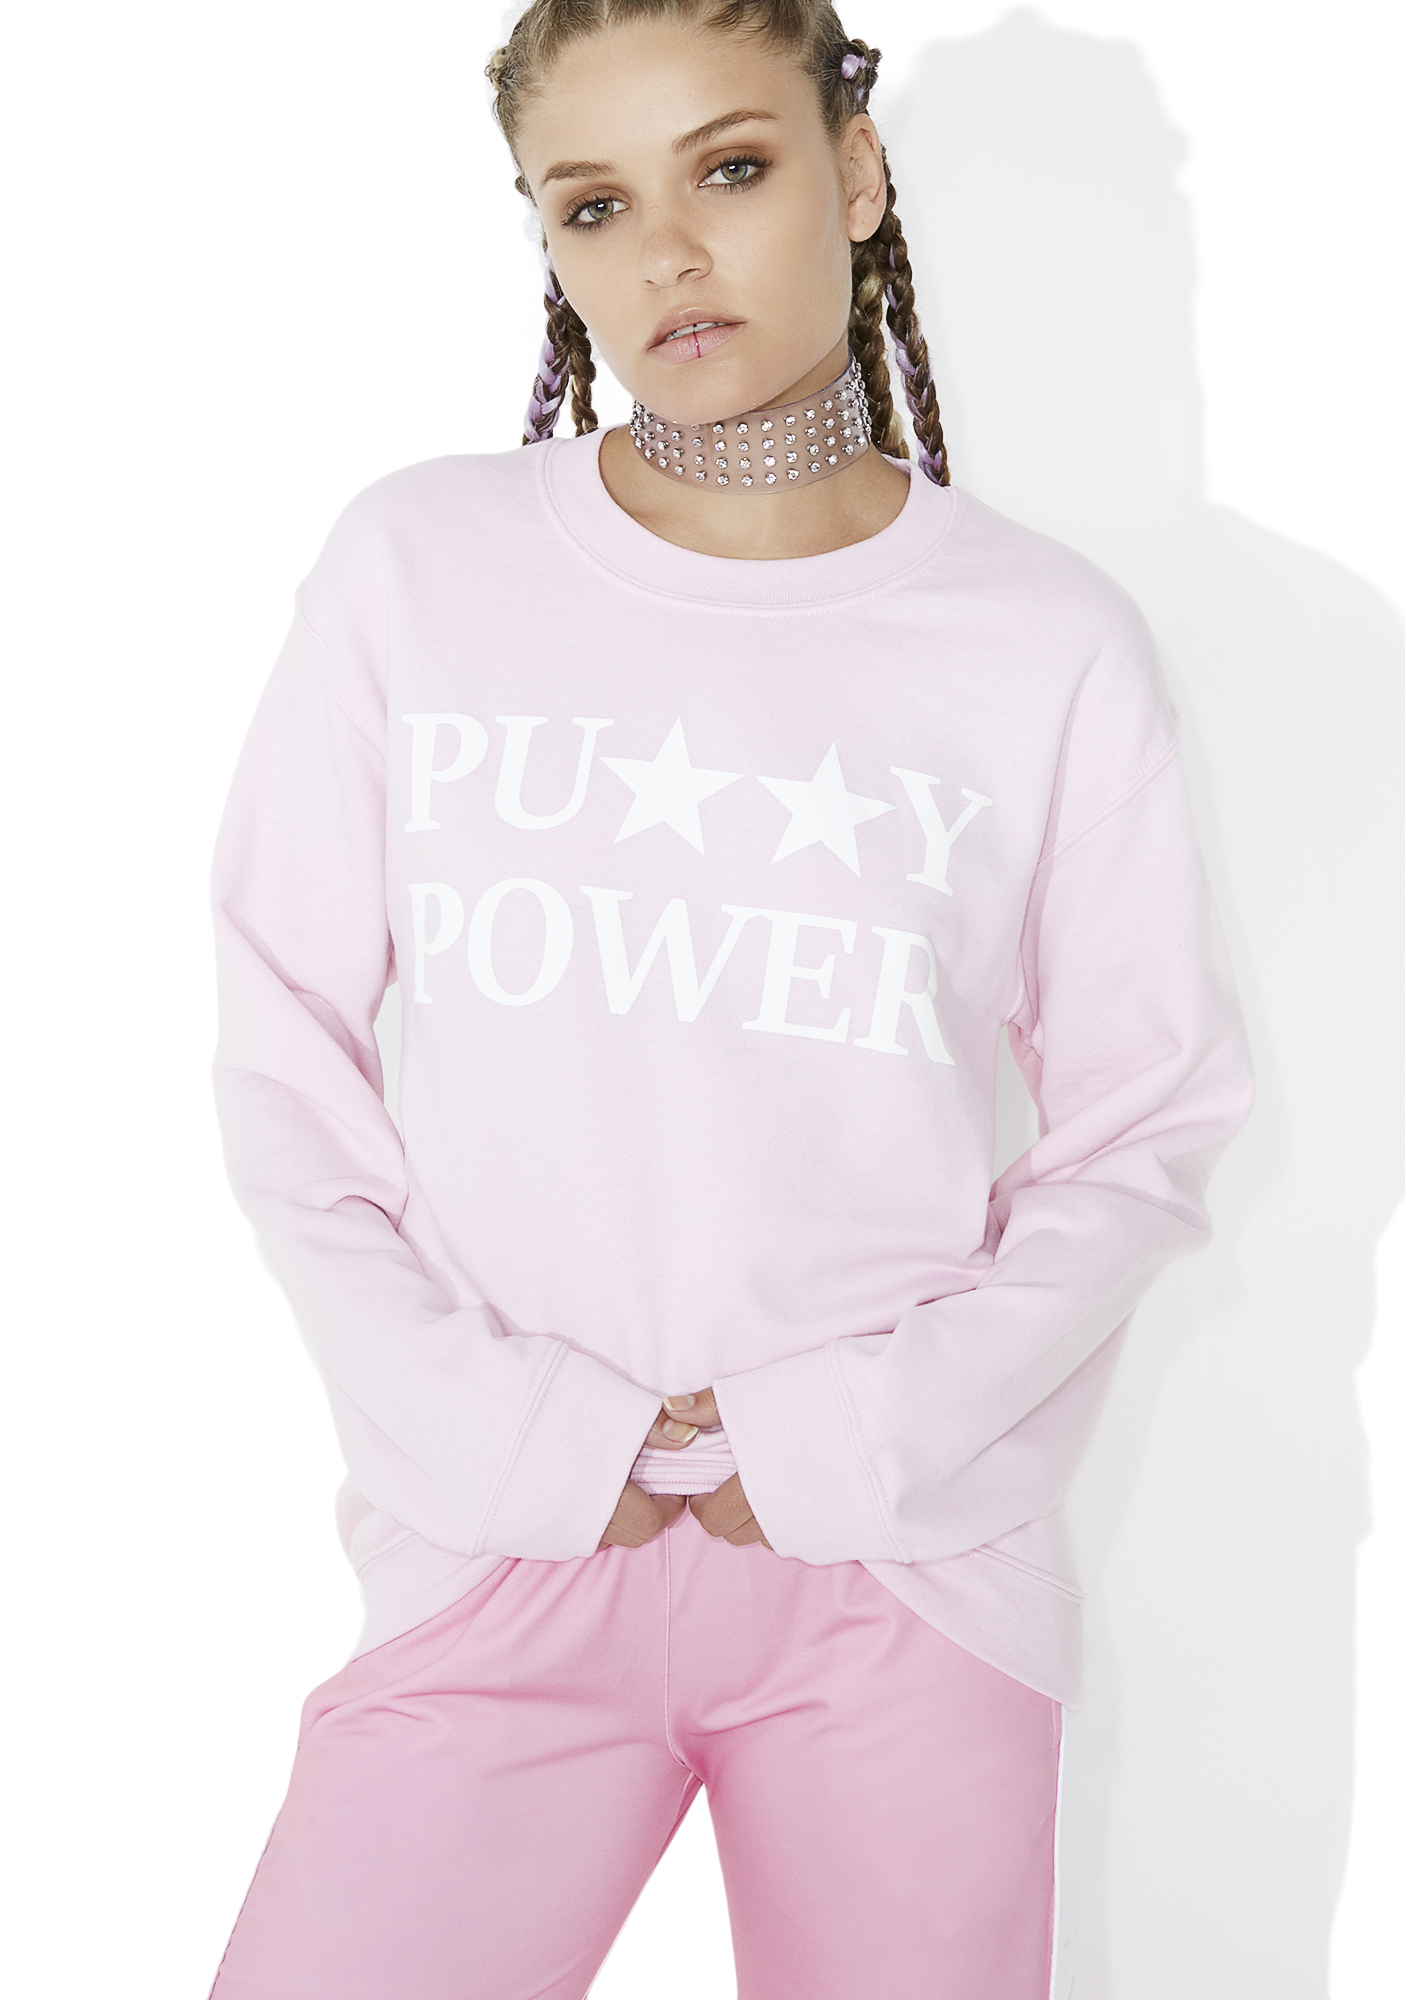 Cross Colours Pu**y Power Sweatshirt